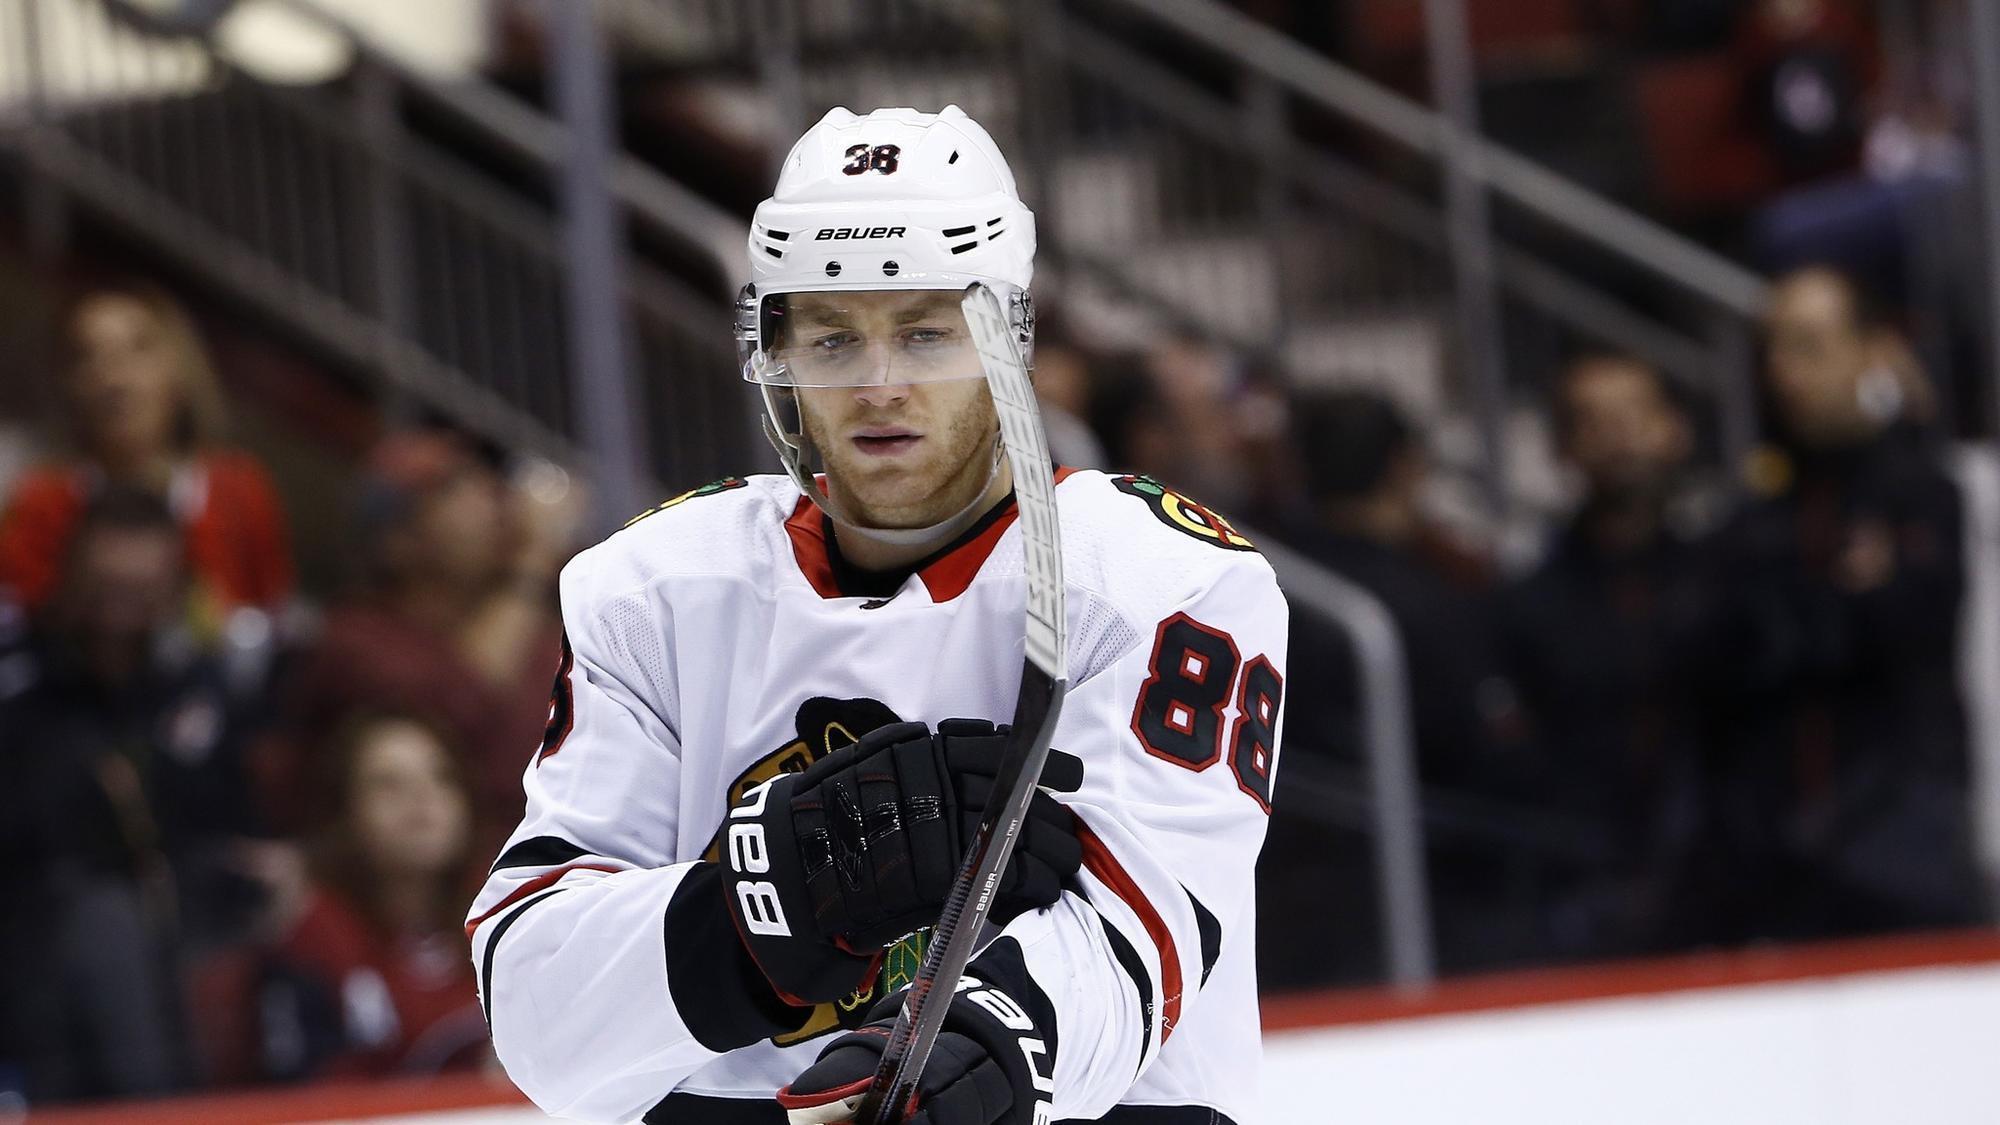 Patrick Kane leading by example on the ice for Blackhawks - Chicago Tribune